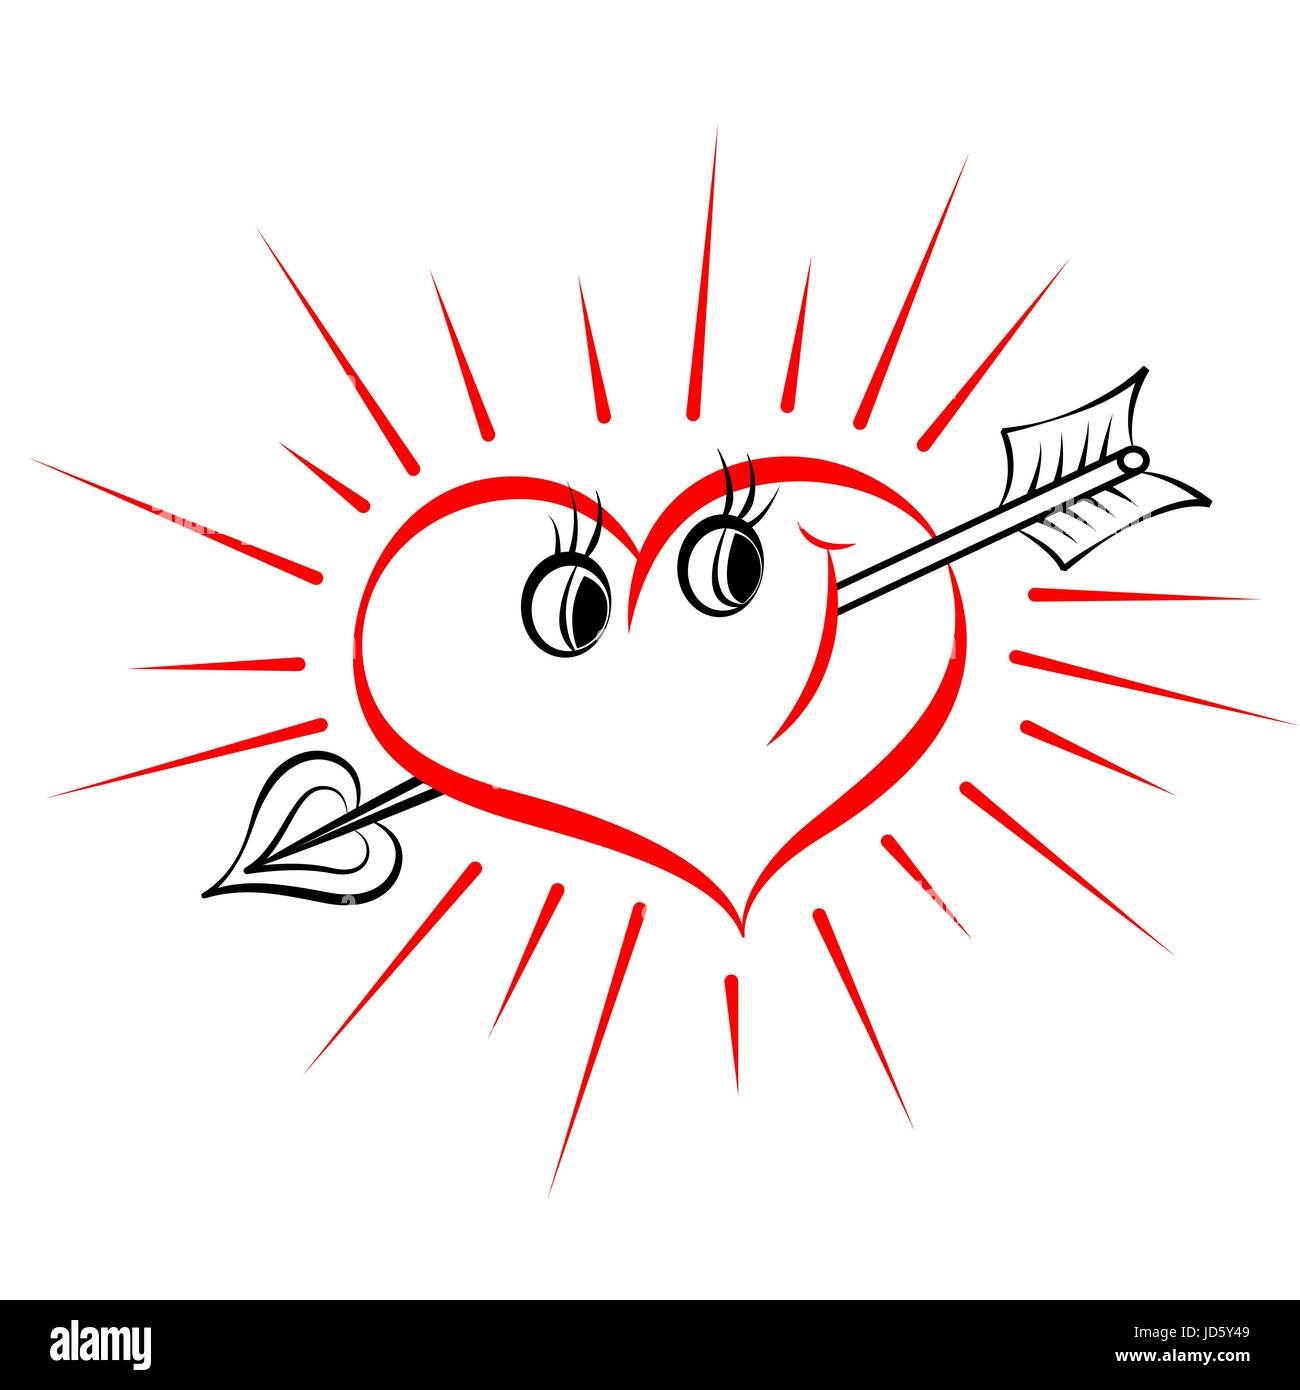 Love Heart Arrow Outline Drawing, Valentine Symbol